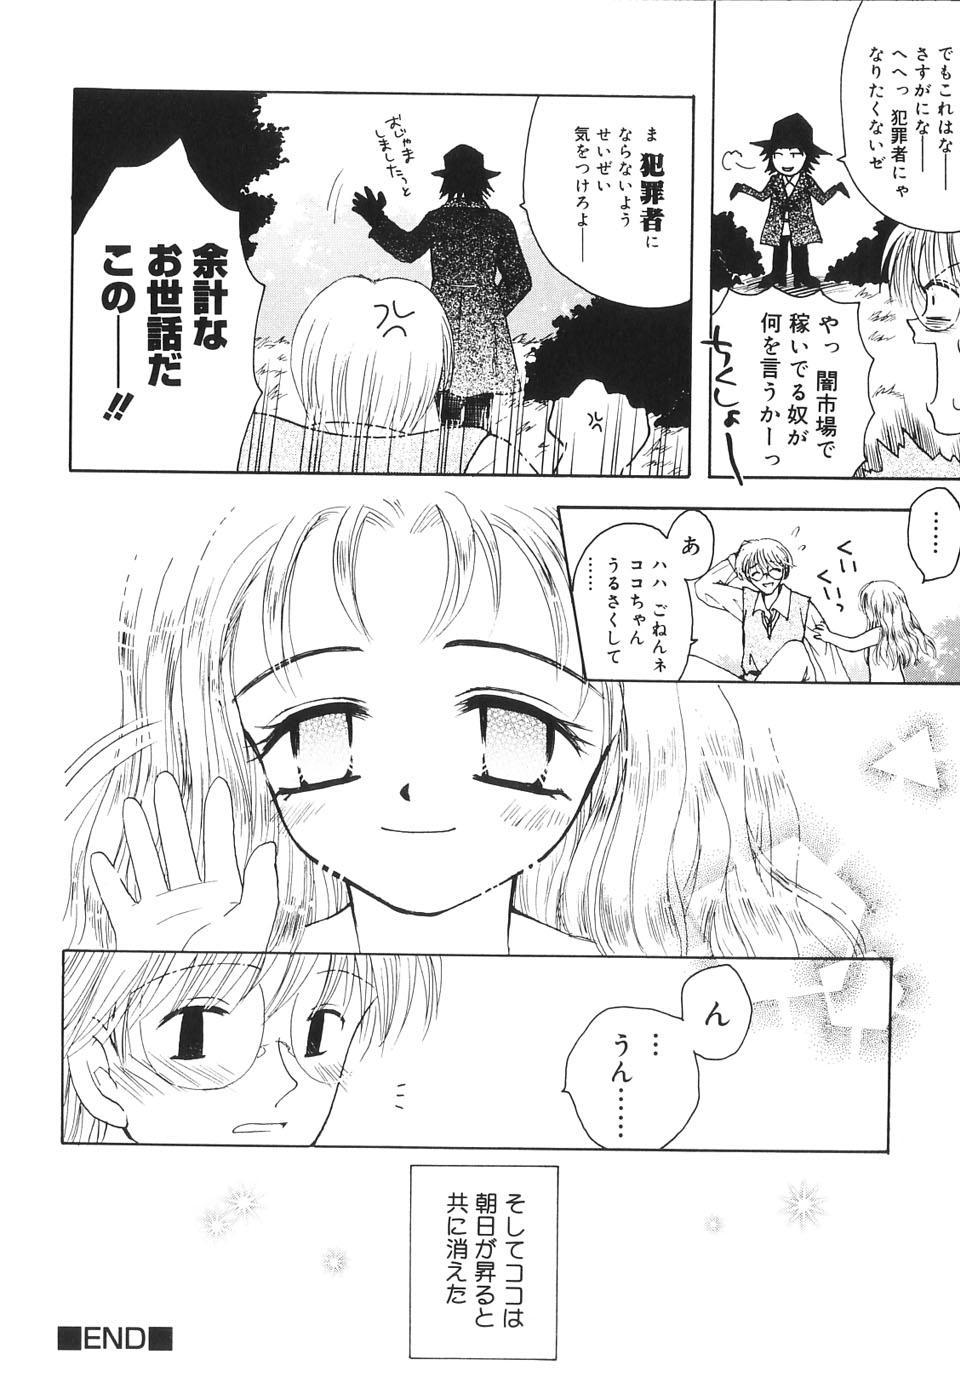 Musoubana 172